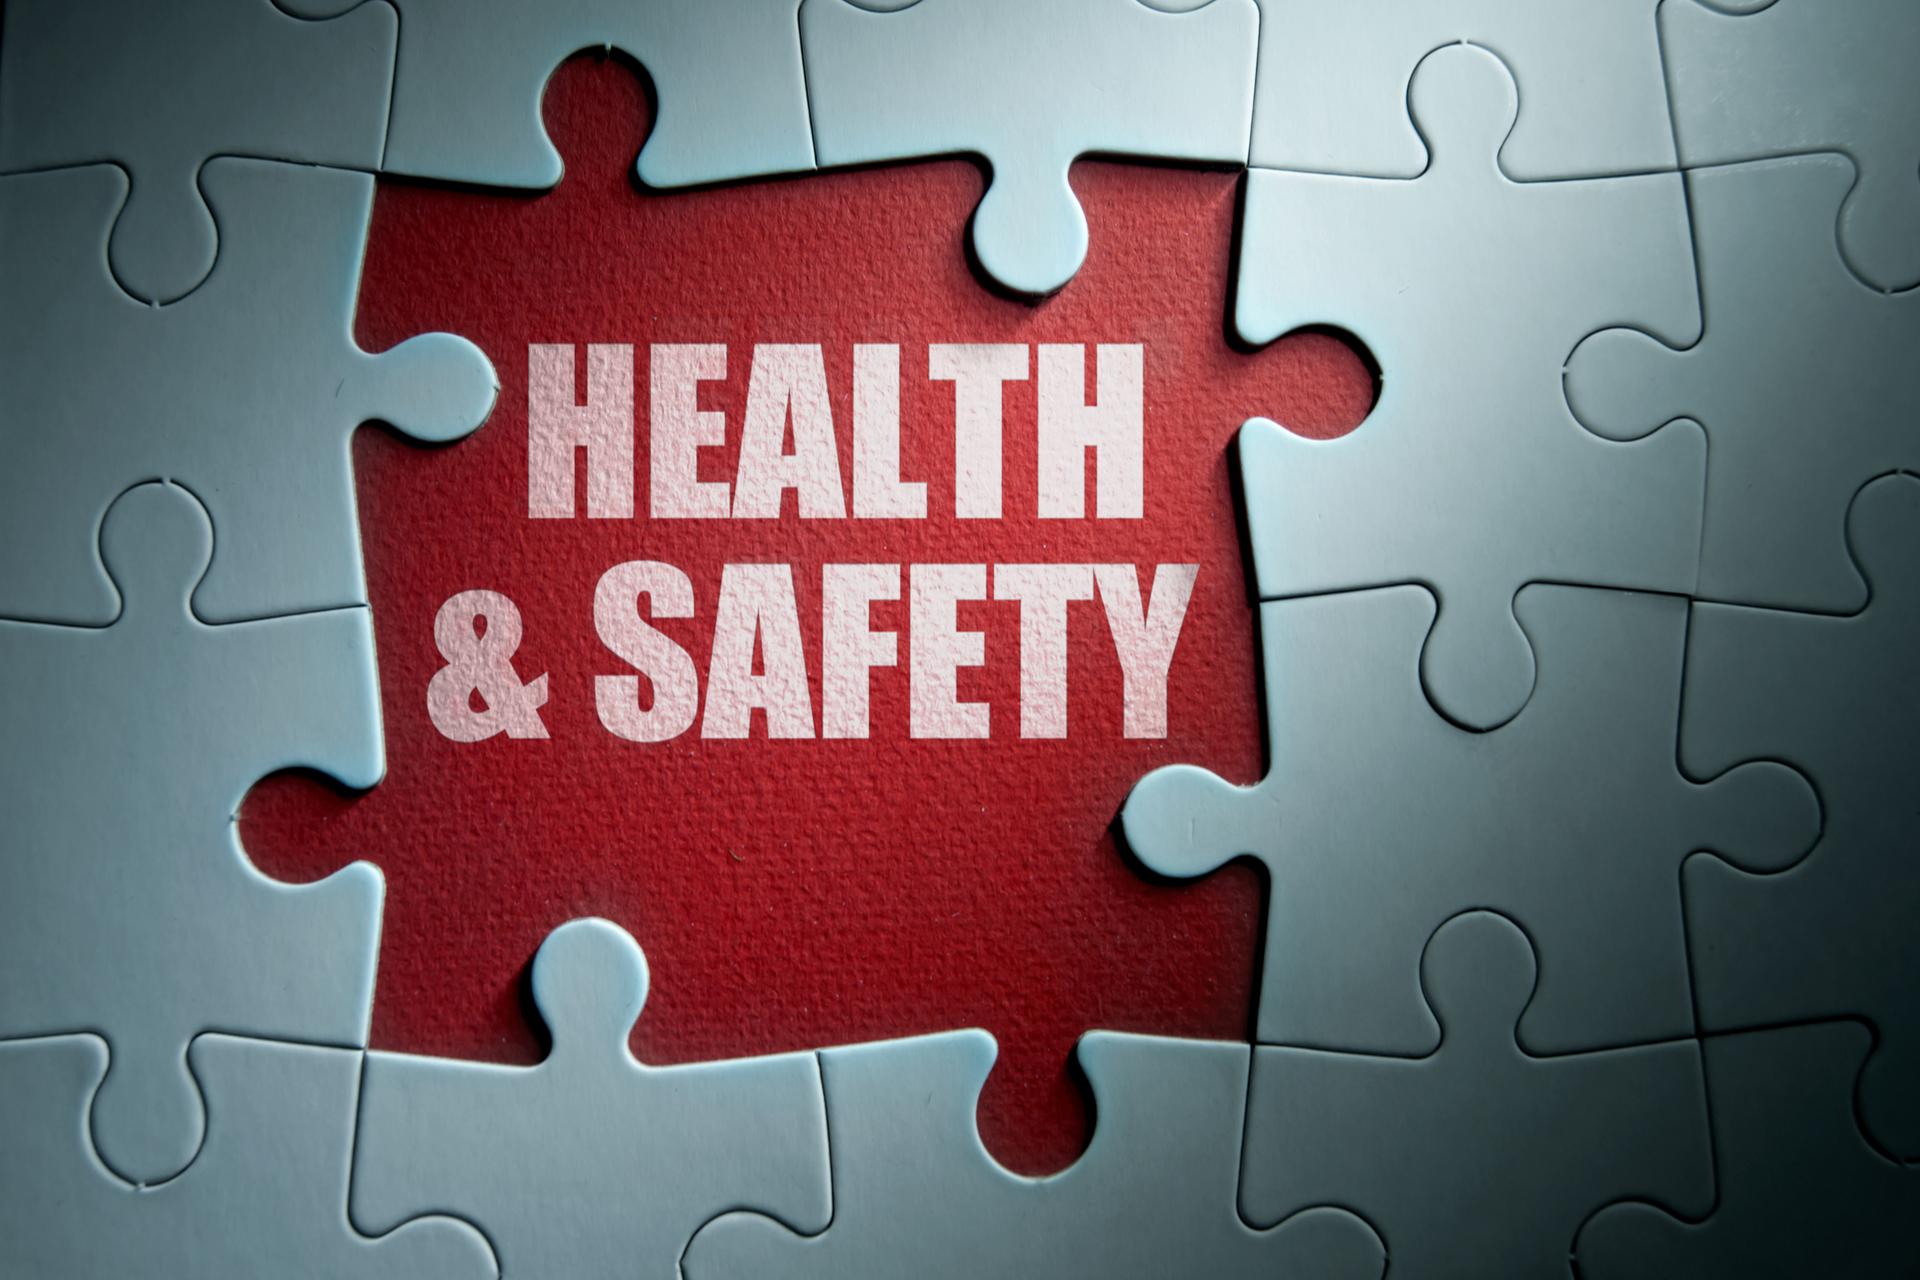 temporary health care standard